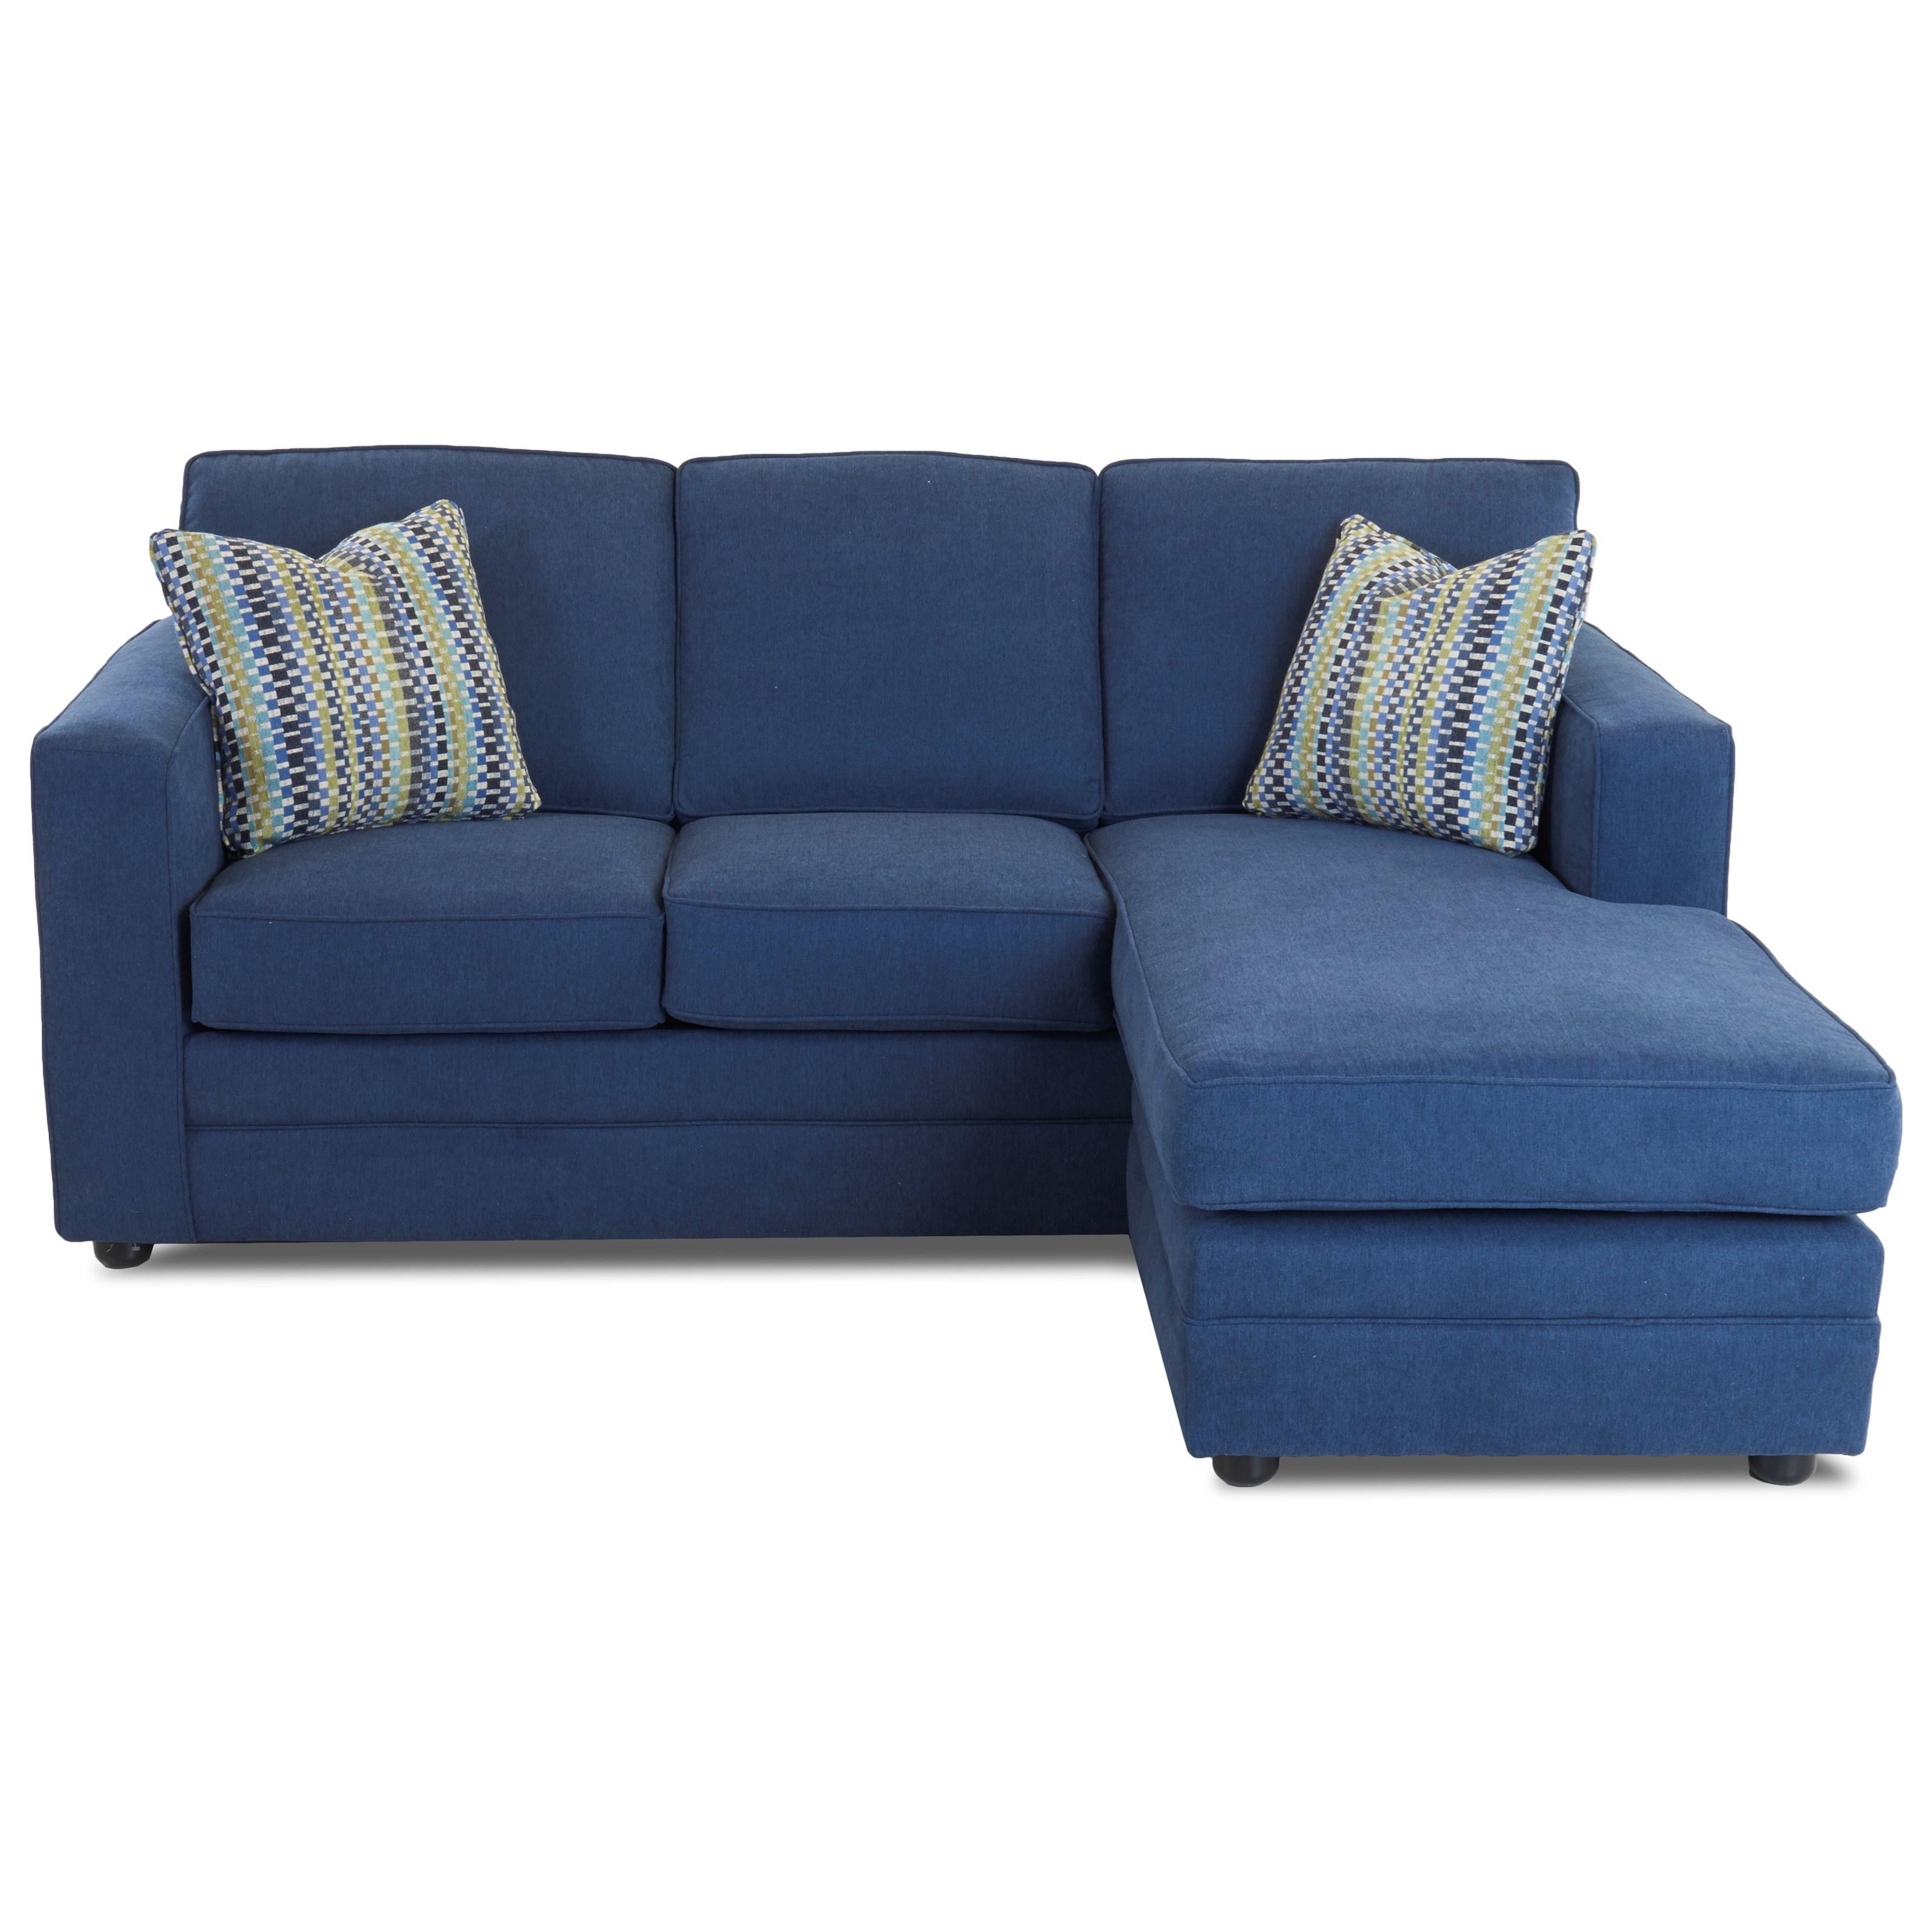 Berger Chaise Sleeper w/ Queen Air Coil Mattress by Klaussner at Northeast Factory Direct